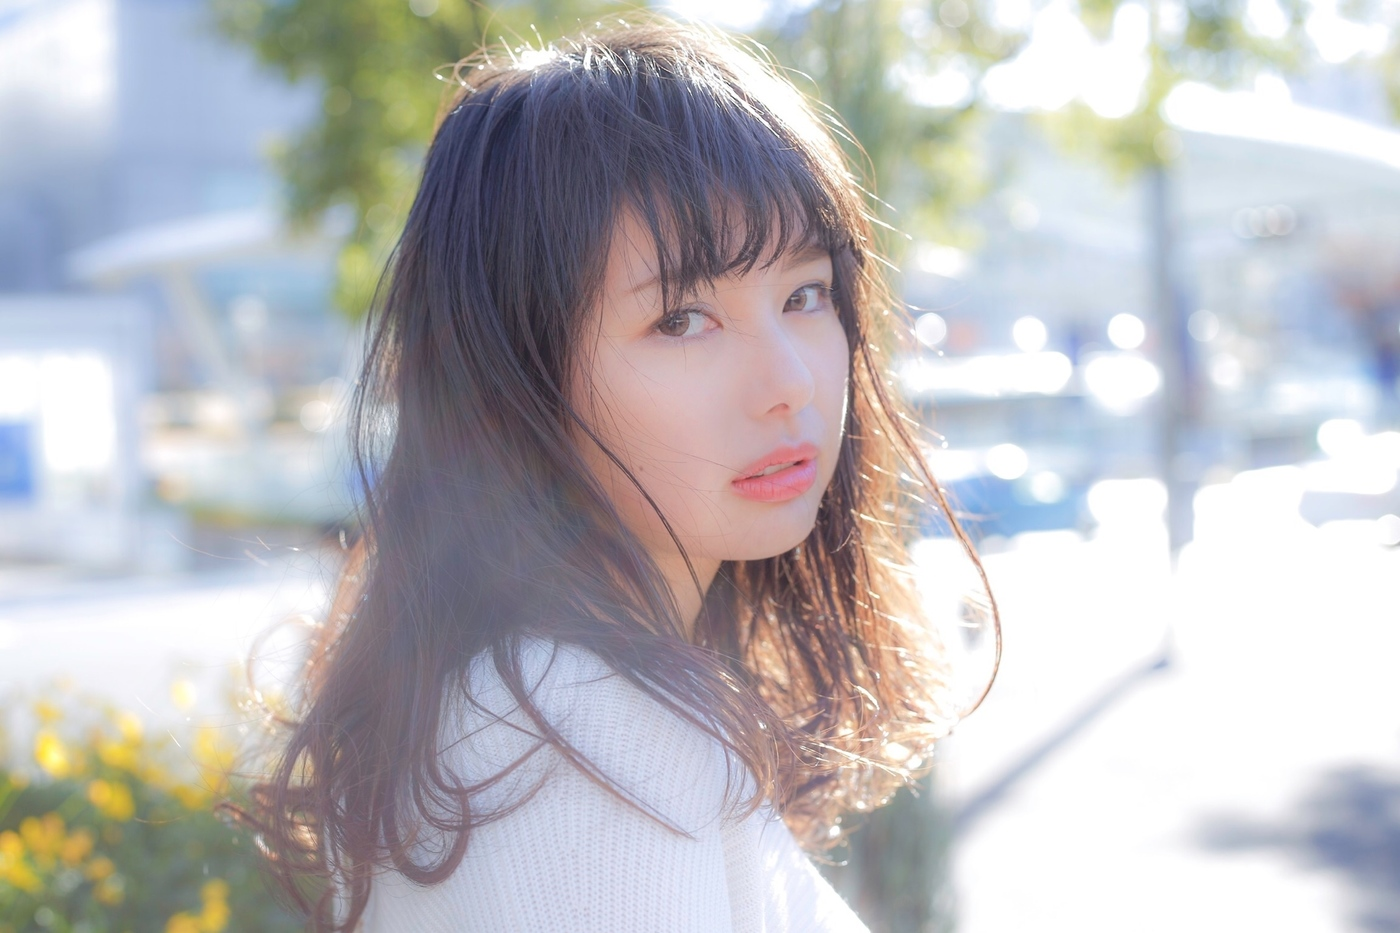 Nagata Takashiが投稿した画像